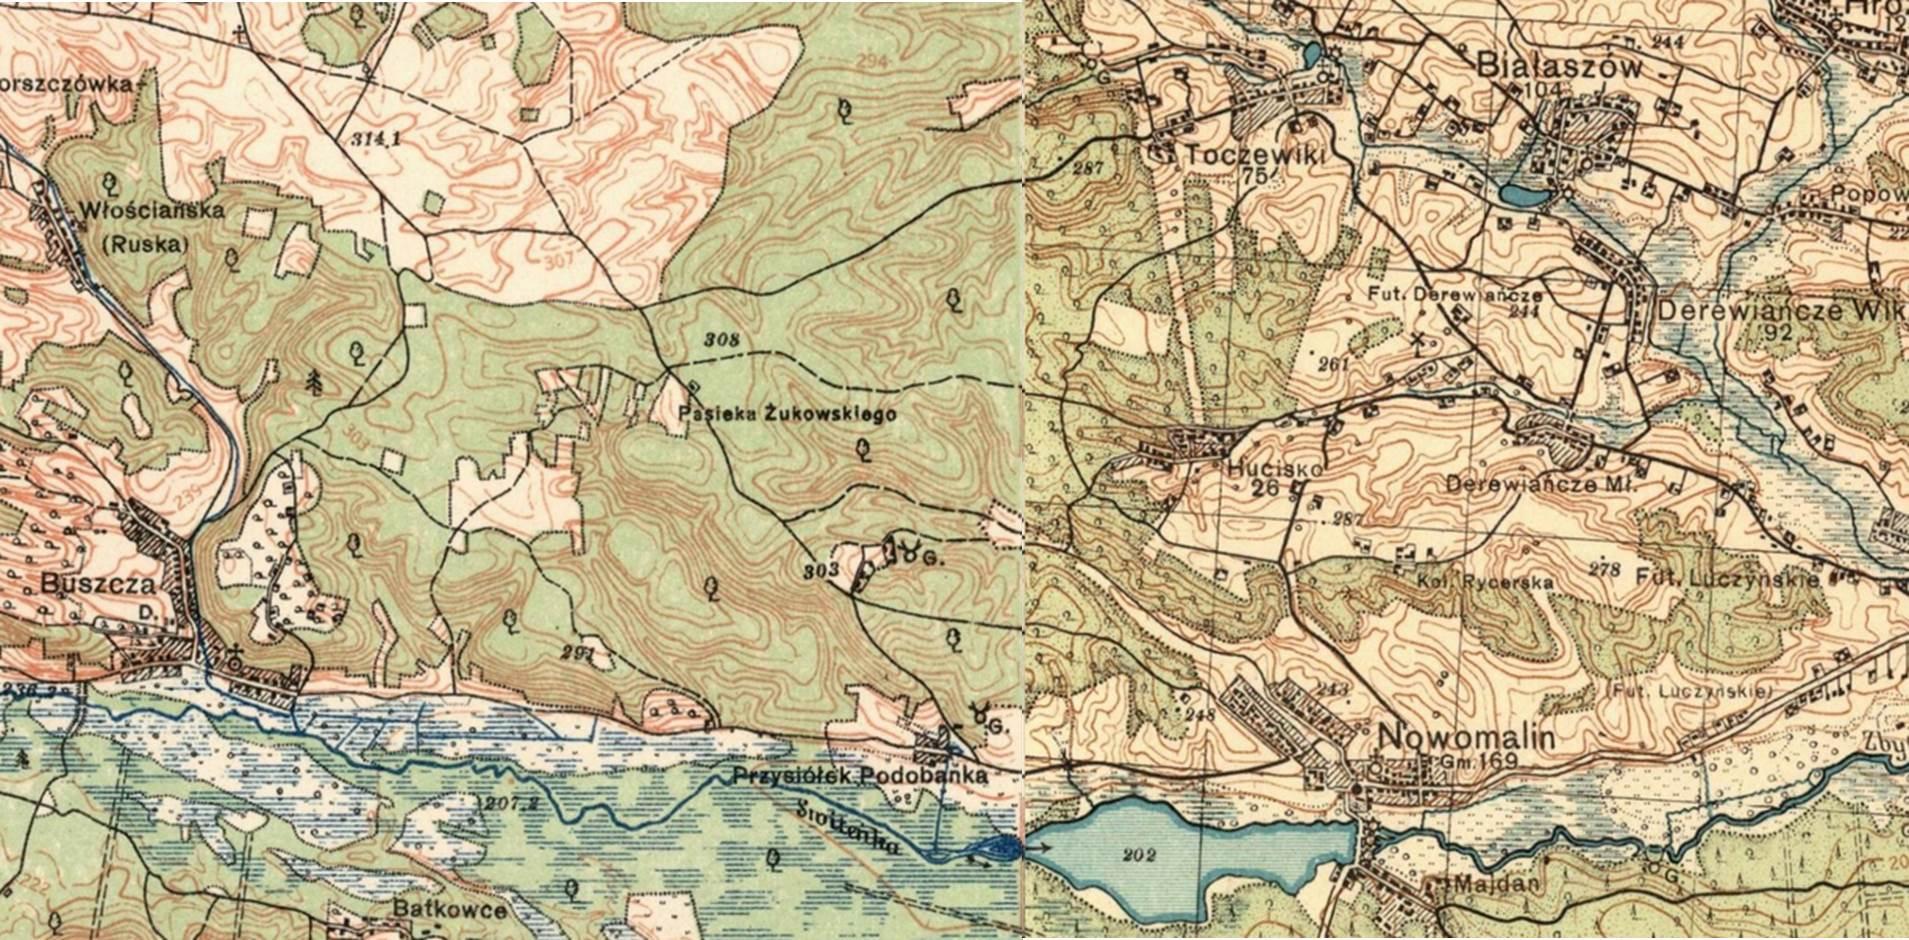 Hucisko i okolice- mapa